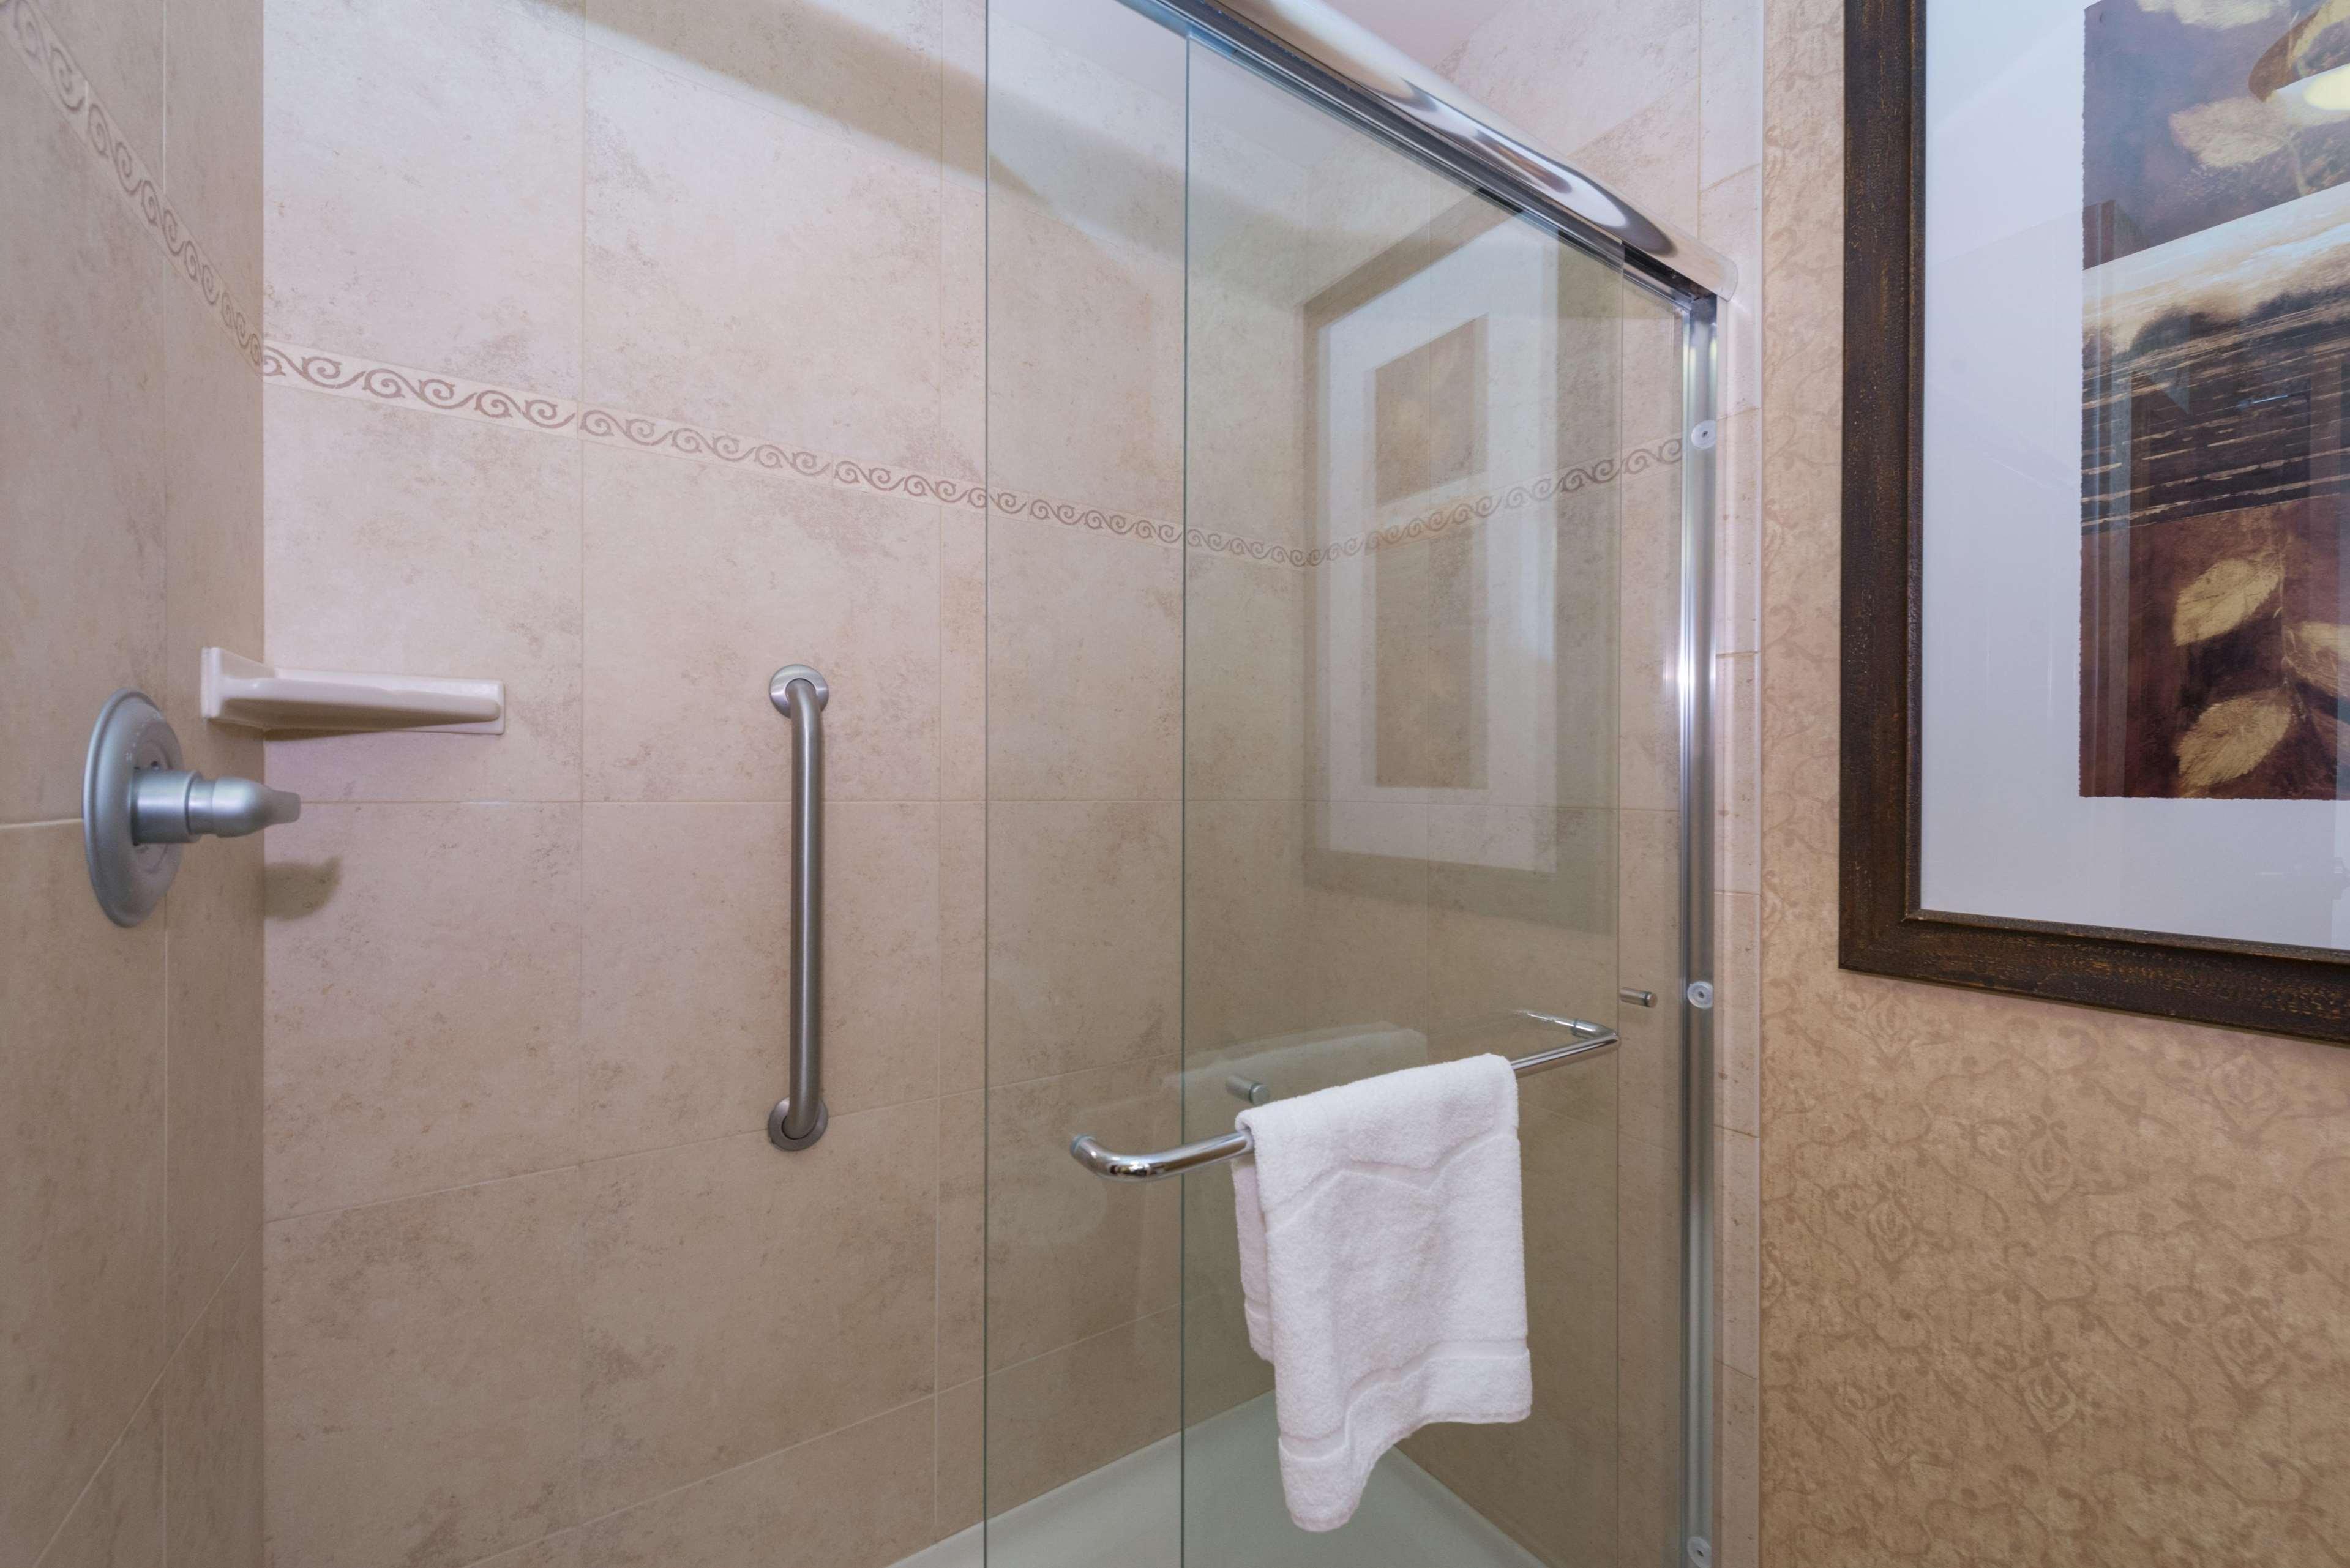 Hampton Inn & Suites Salt Lake City-West Jordan image 27